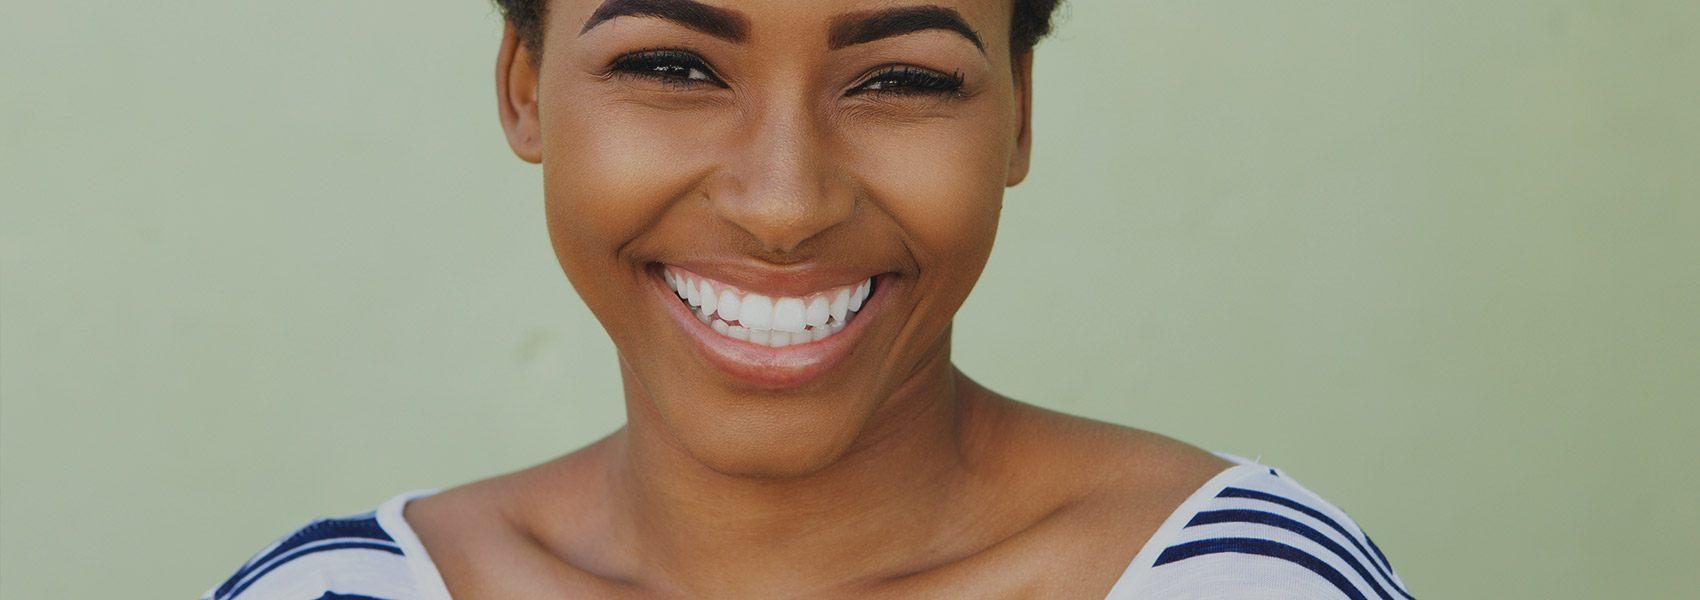 Oral Sedation - Distinctive Dentistry